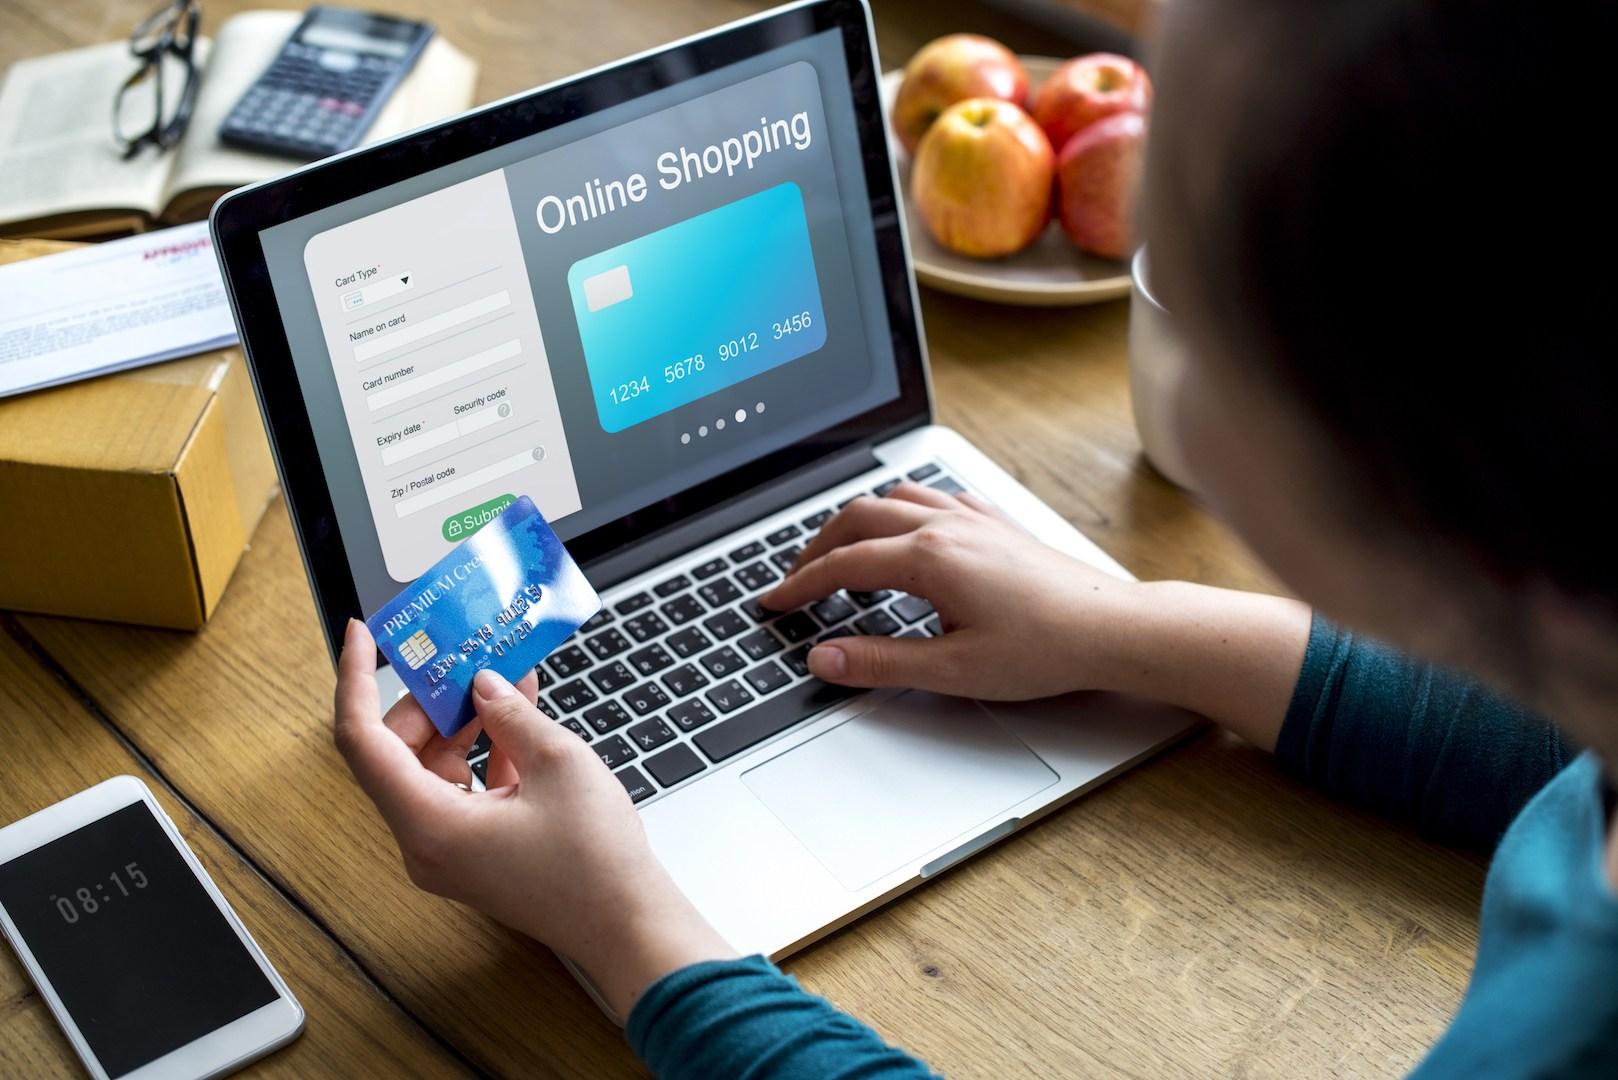 A Libra pretende facilitar pagamentos e eliminar taxas bancárias